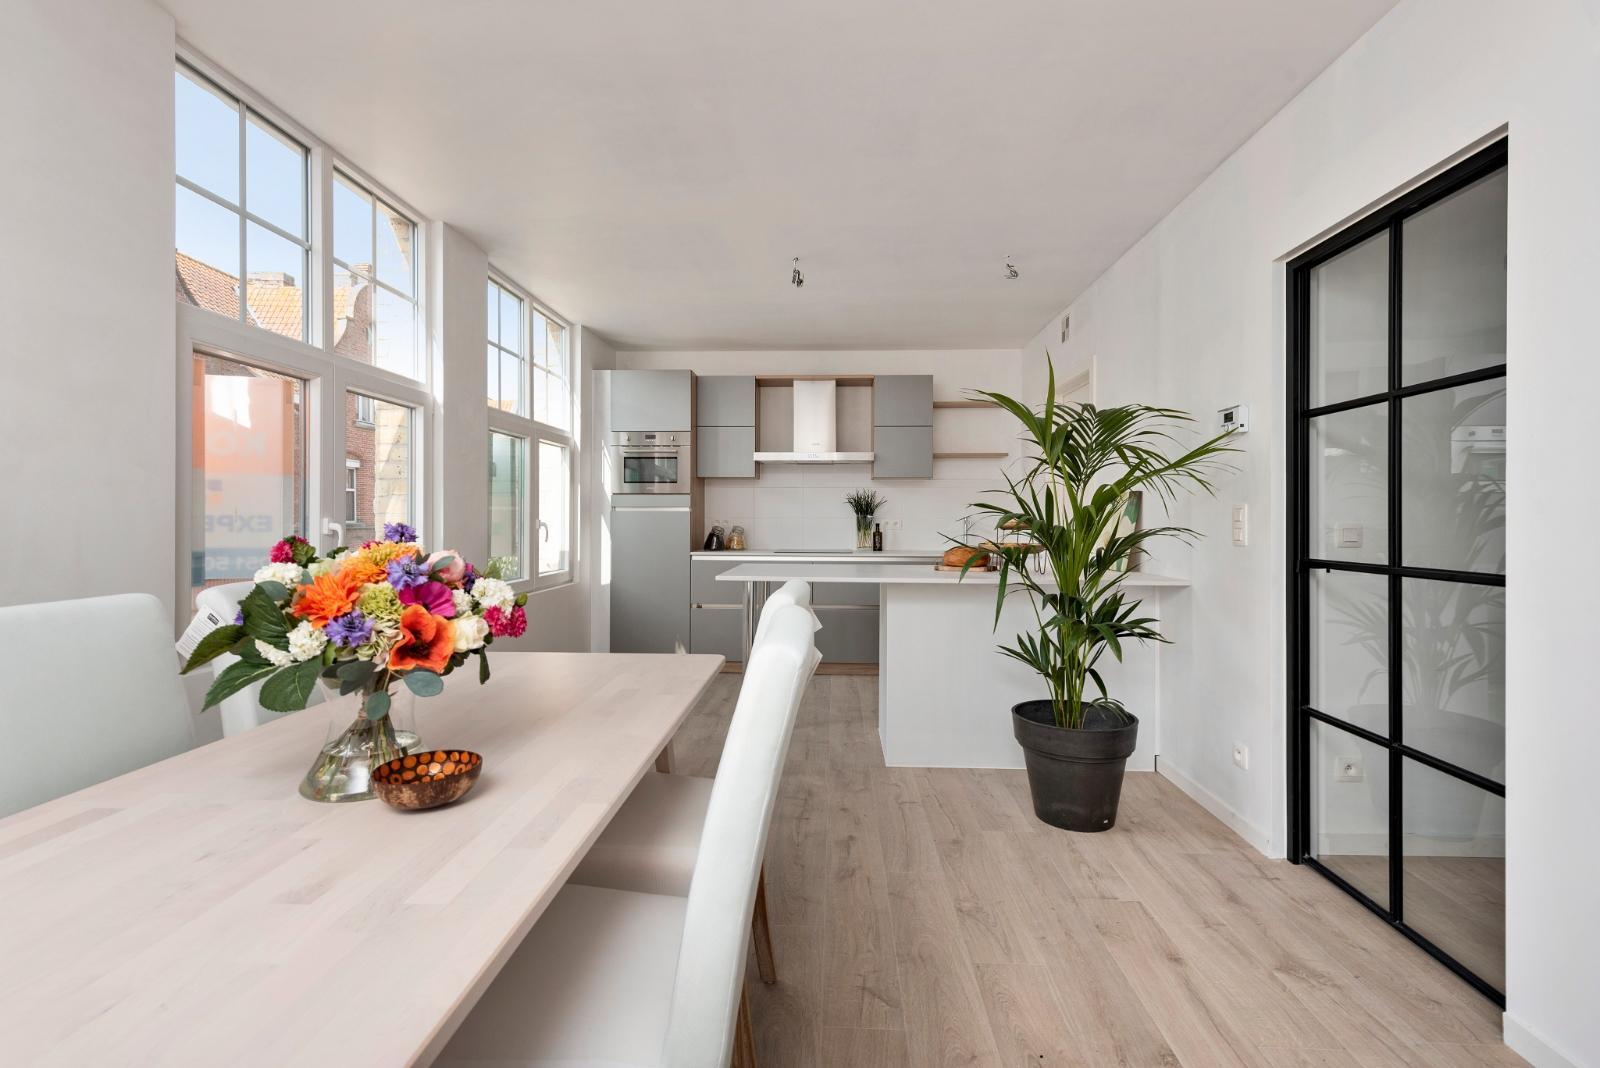 Prachtig appartement met super ruim terras in centrum Diksmuide - 2